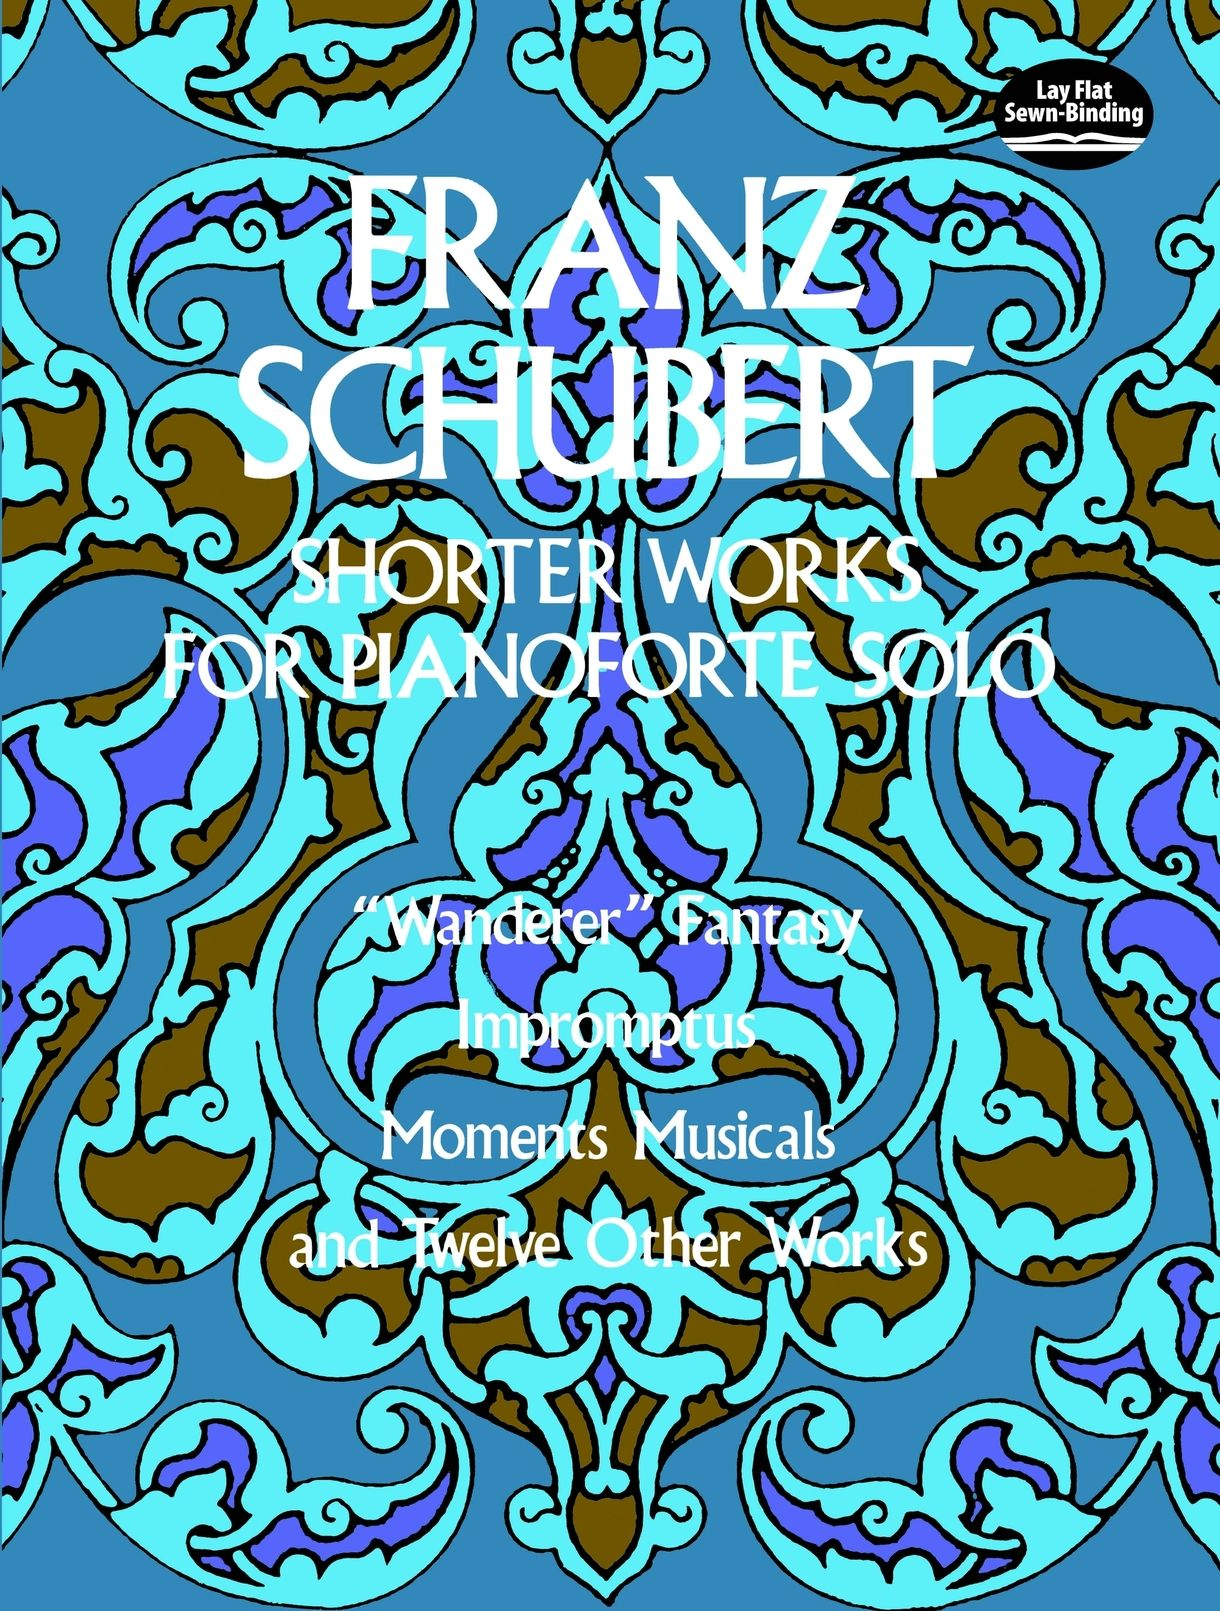 Shorter Works for Pianoforte Solo. Piano Sheet MusicClassical ...